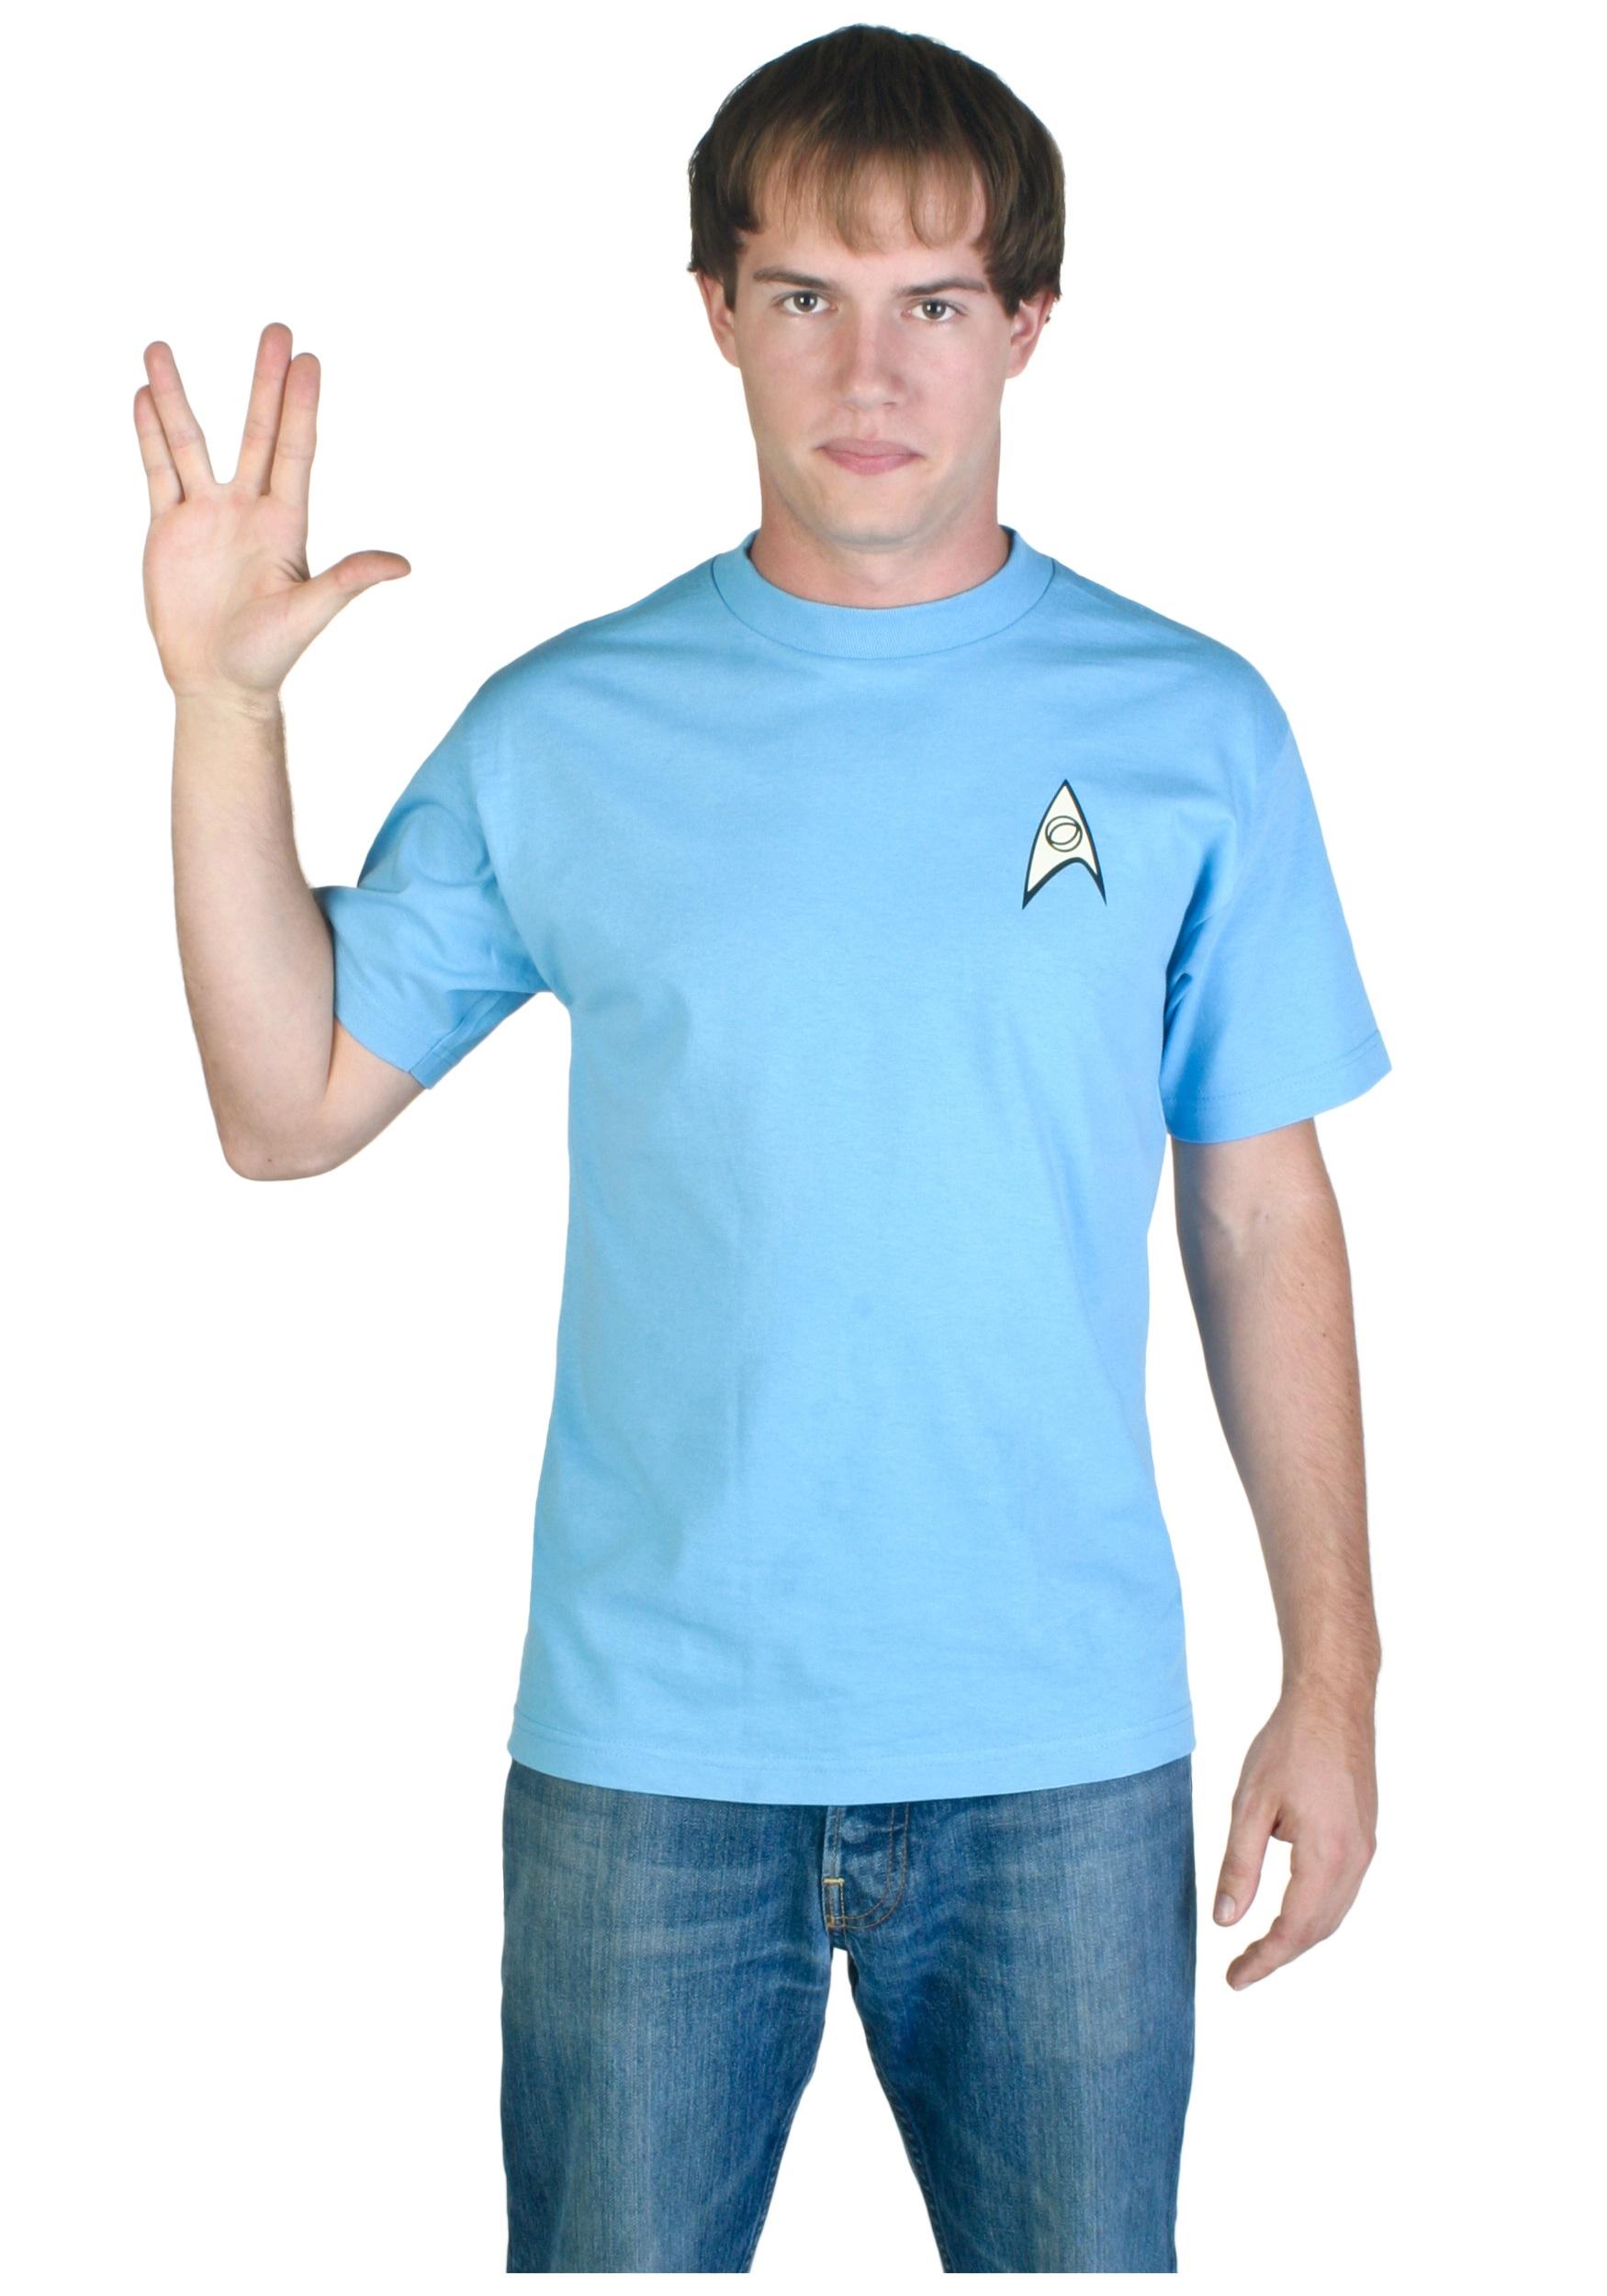 Blue Star Trek Costume T Shirt Halloween Costumes